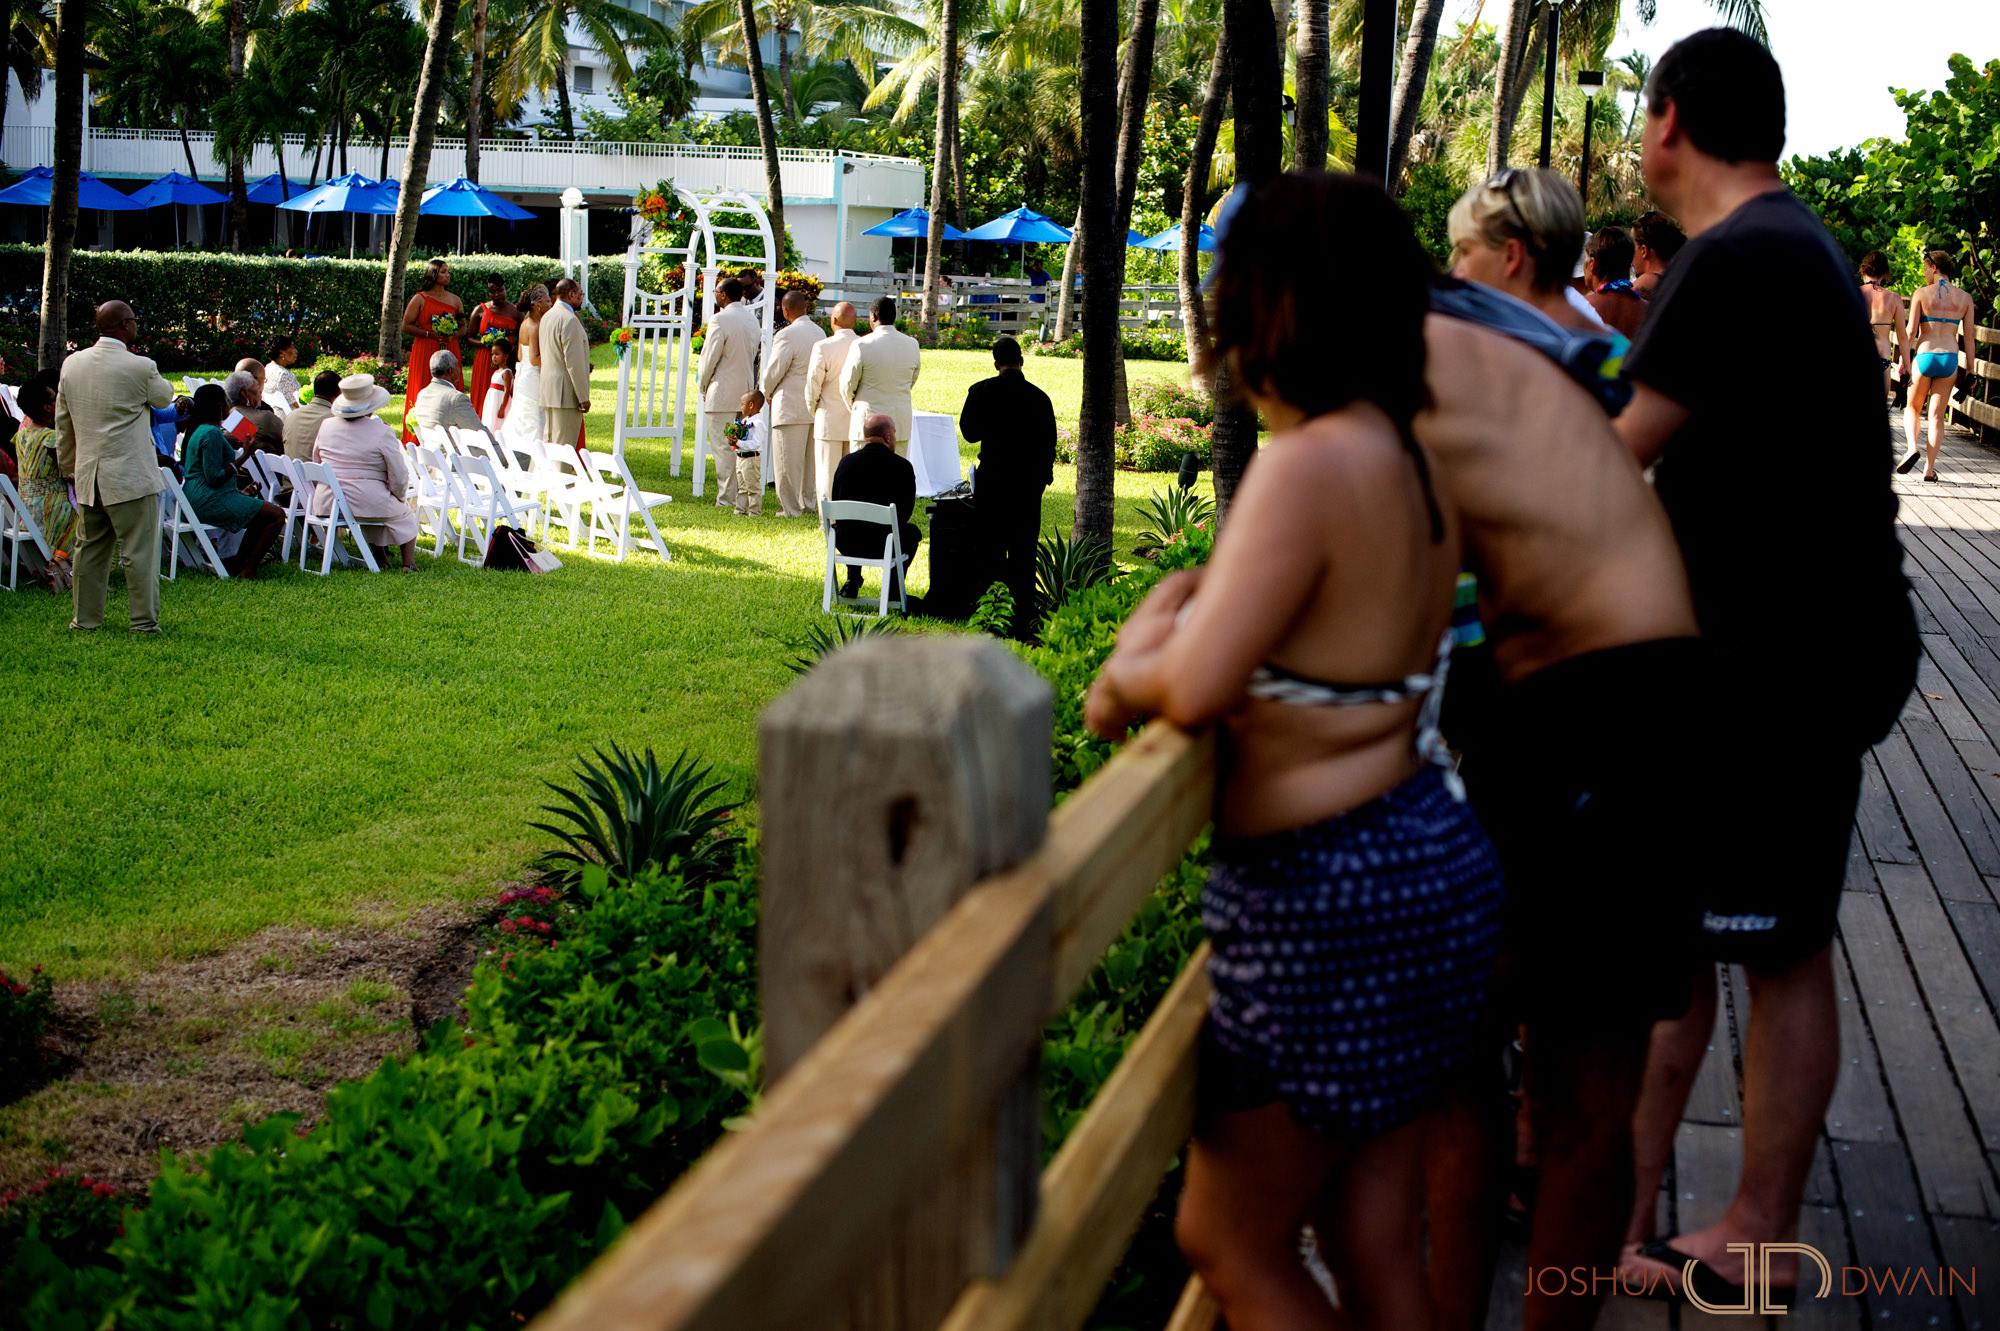 candra-alonza-007-holiday-inn-south-beach-miami-wedding-photographer-joshua-dwain-2012-07-28_ca_146